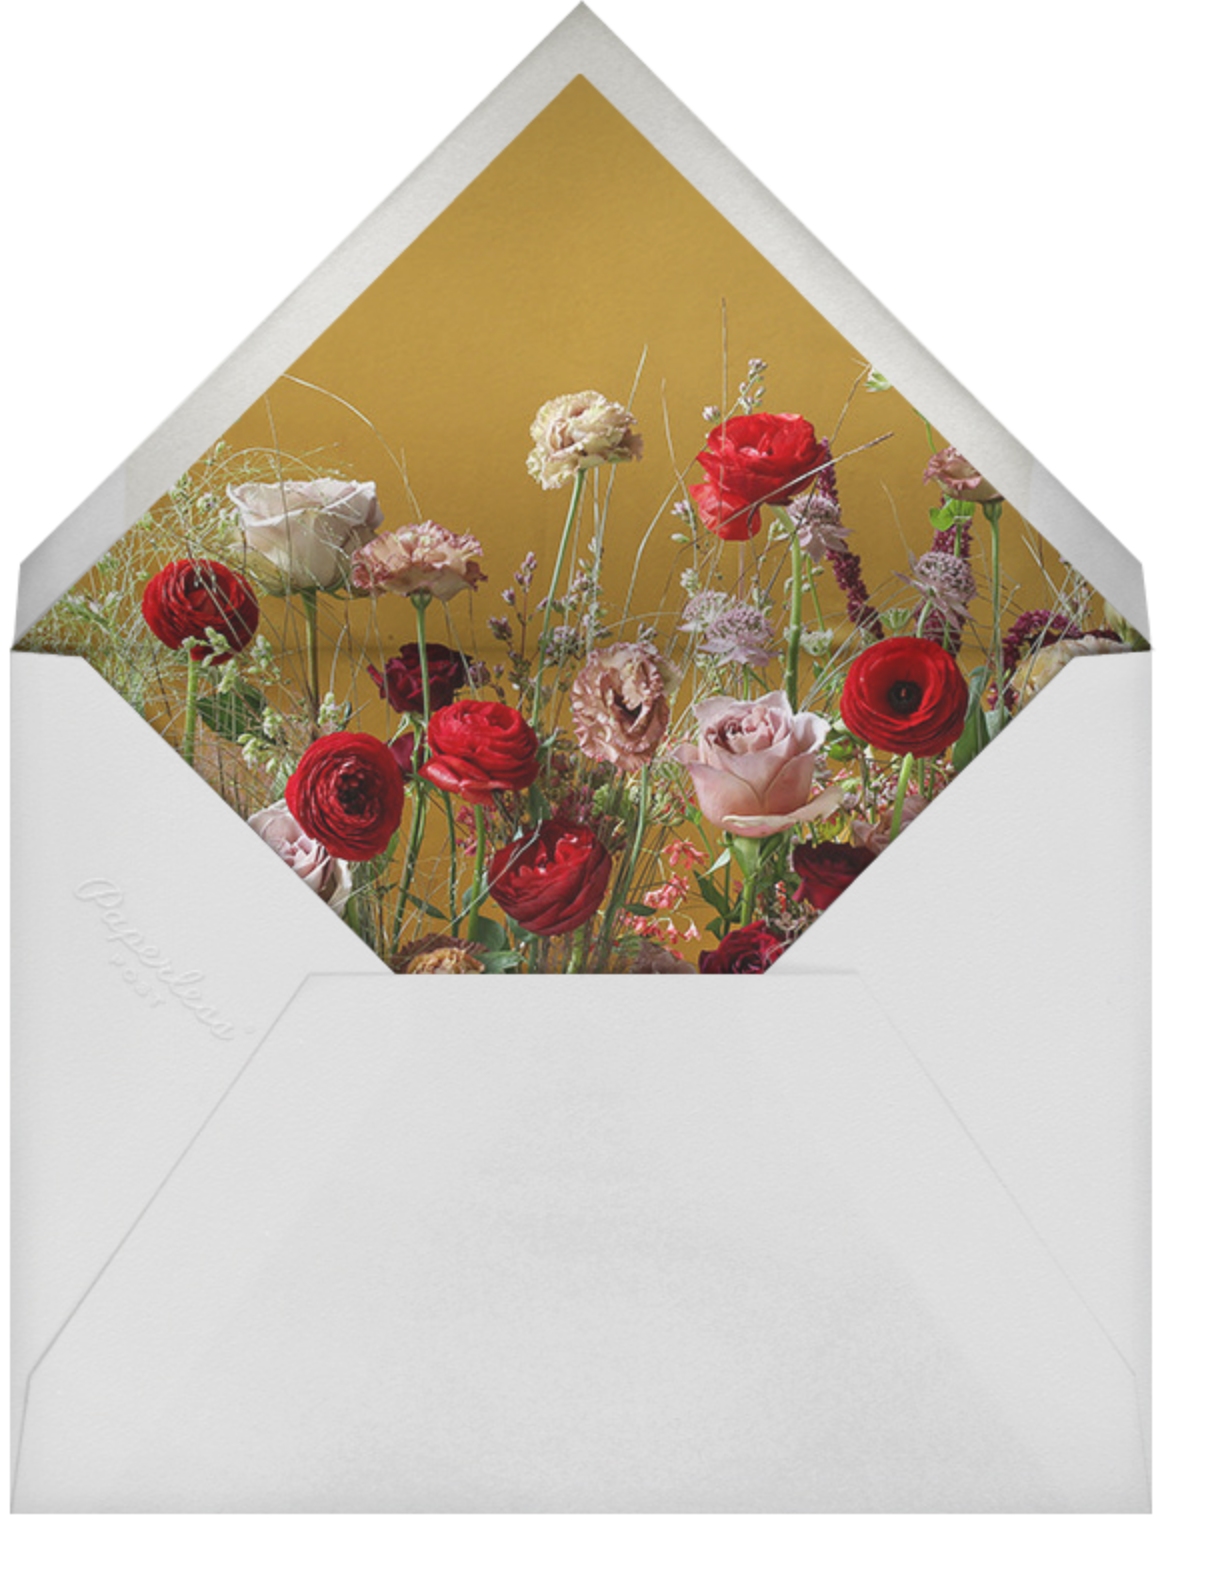 Germinal (Photo Save the Date) - Putnam & Putnam - Save the date - envelope back